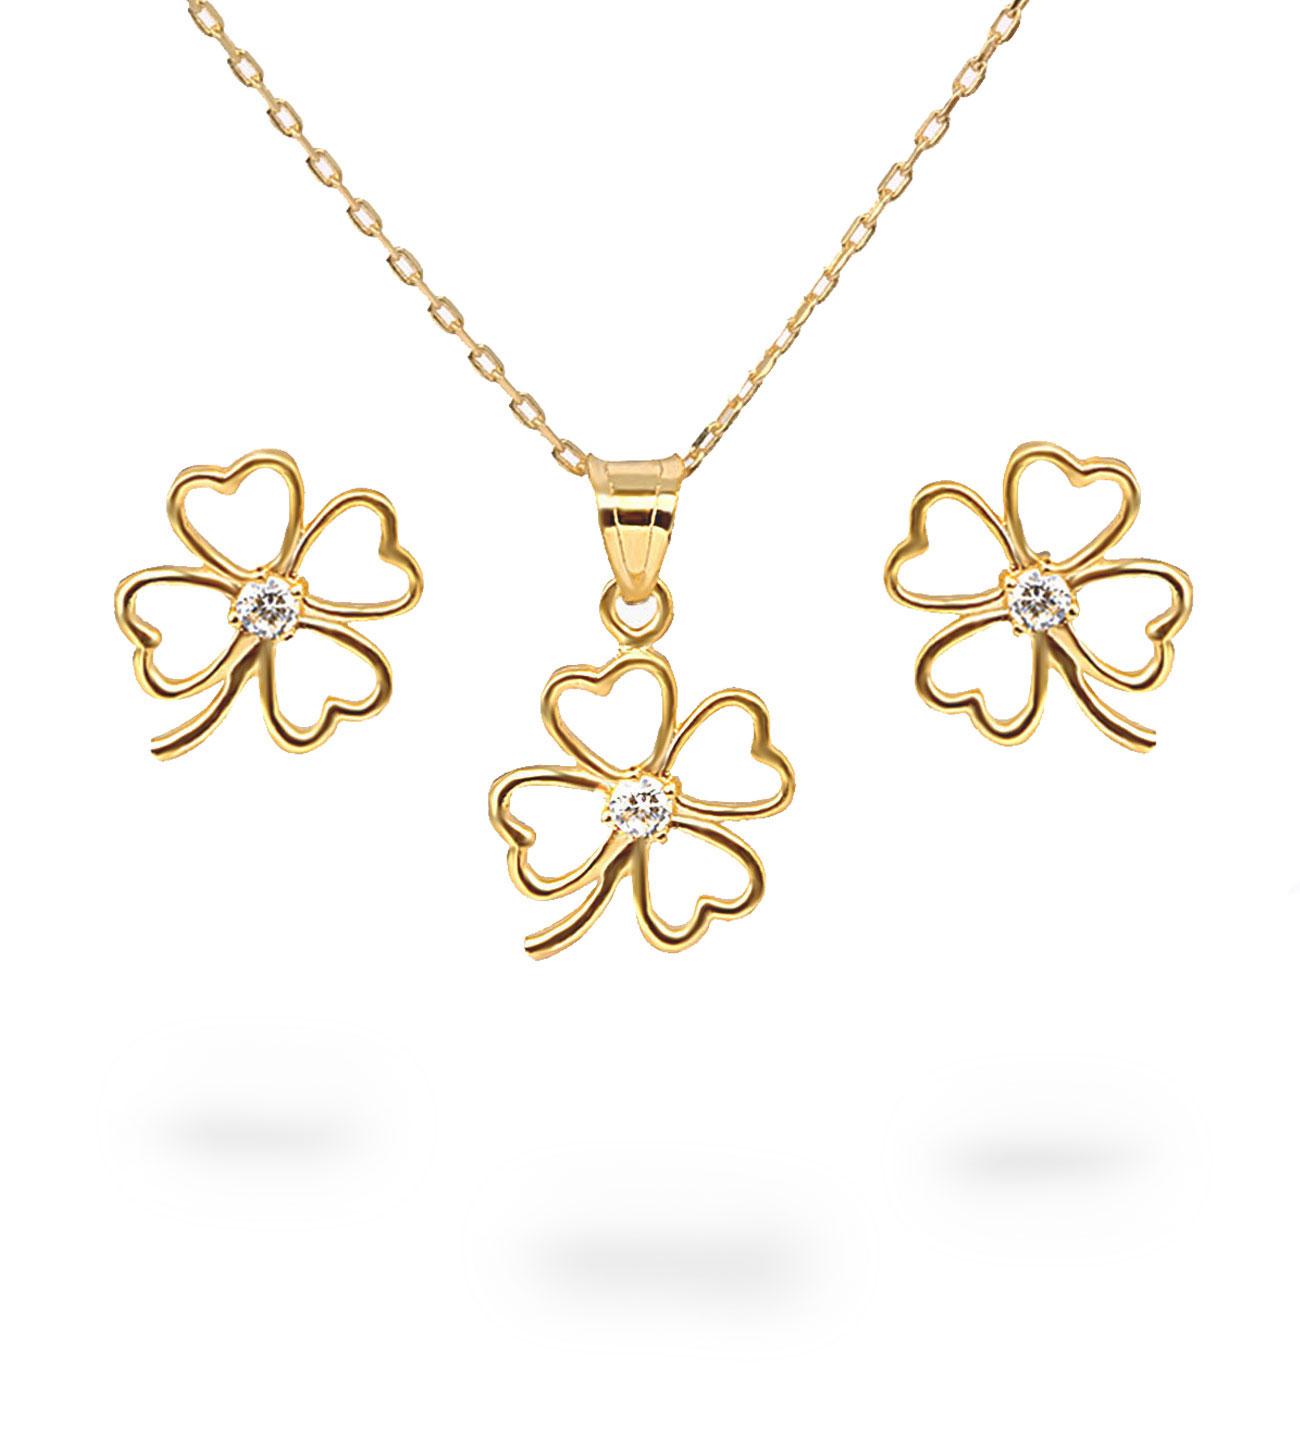 Women's Clover Pendant Gold Necklace & Earrings Set